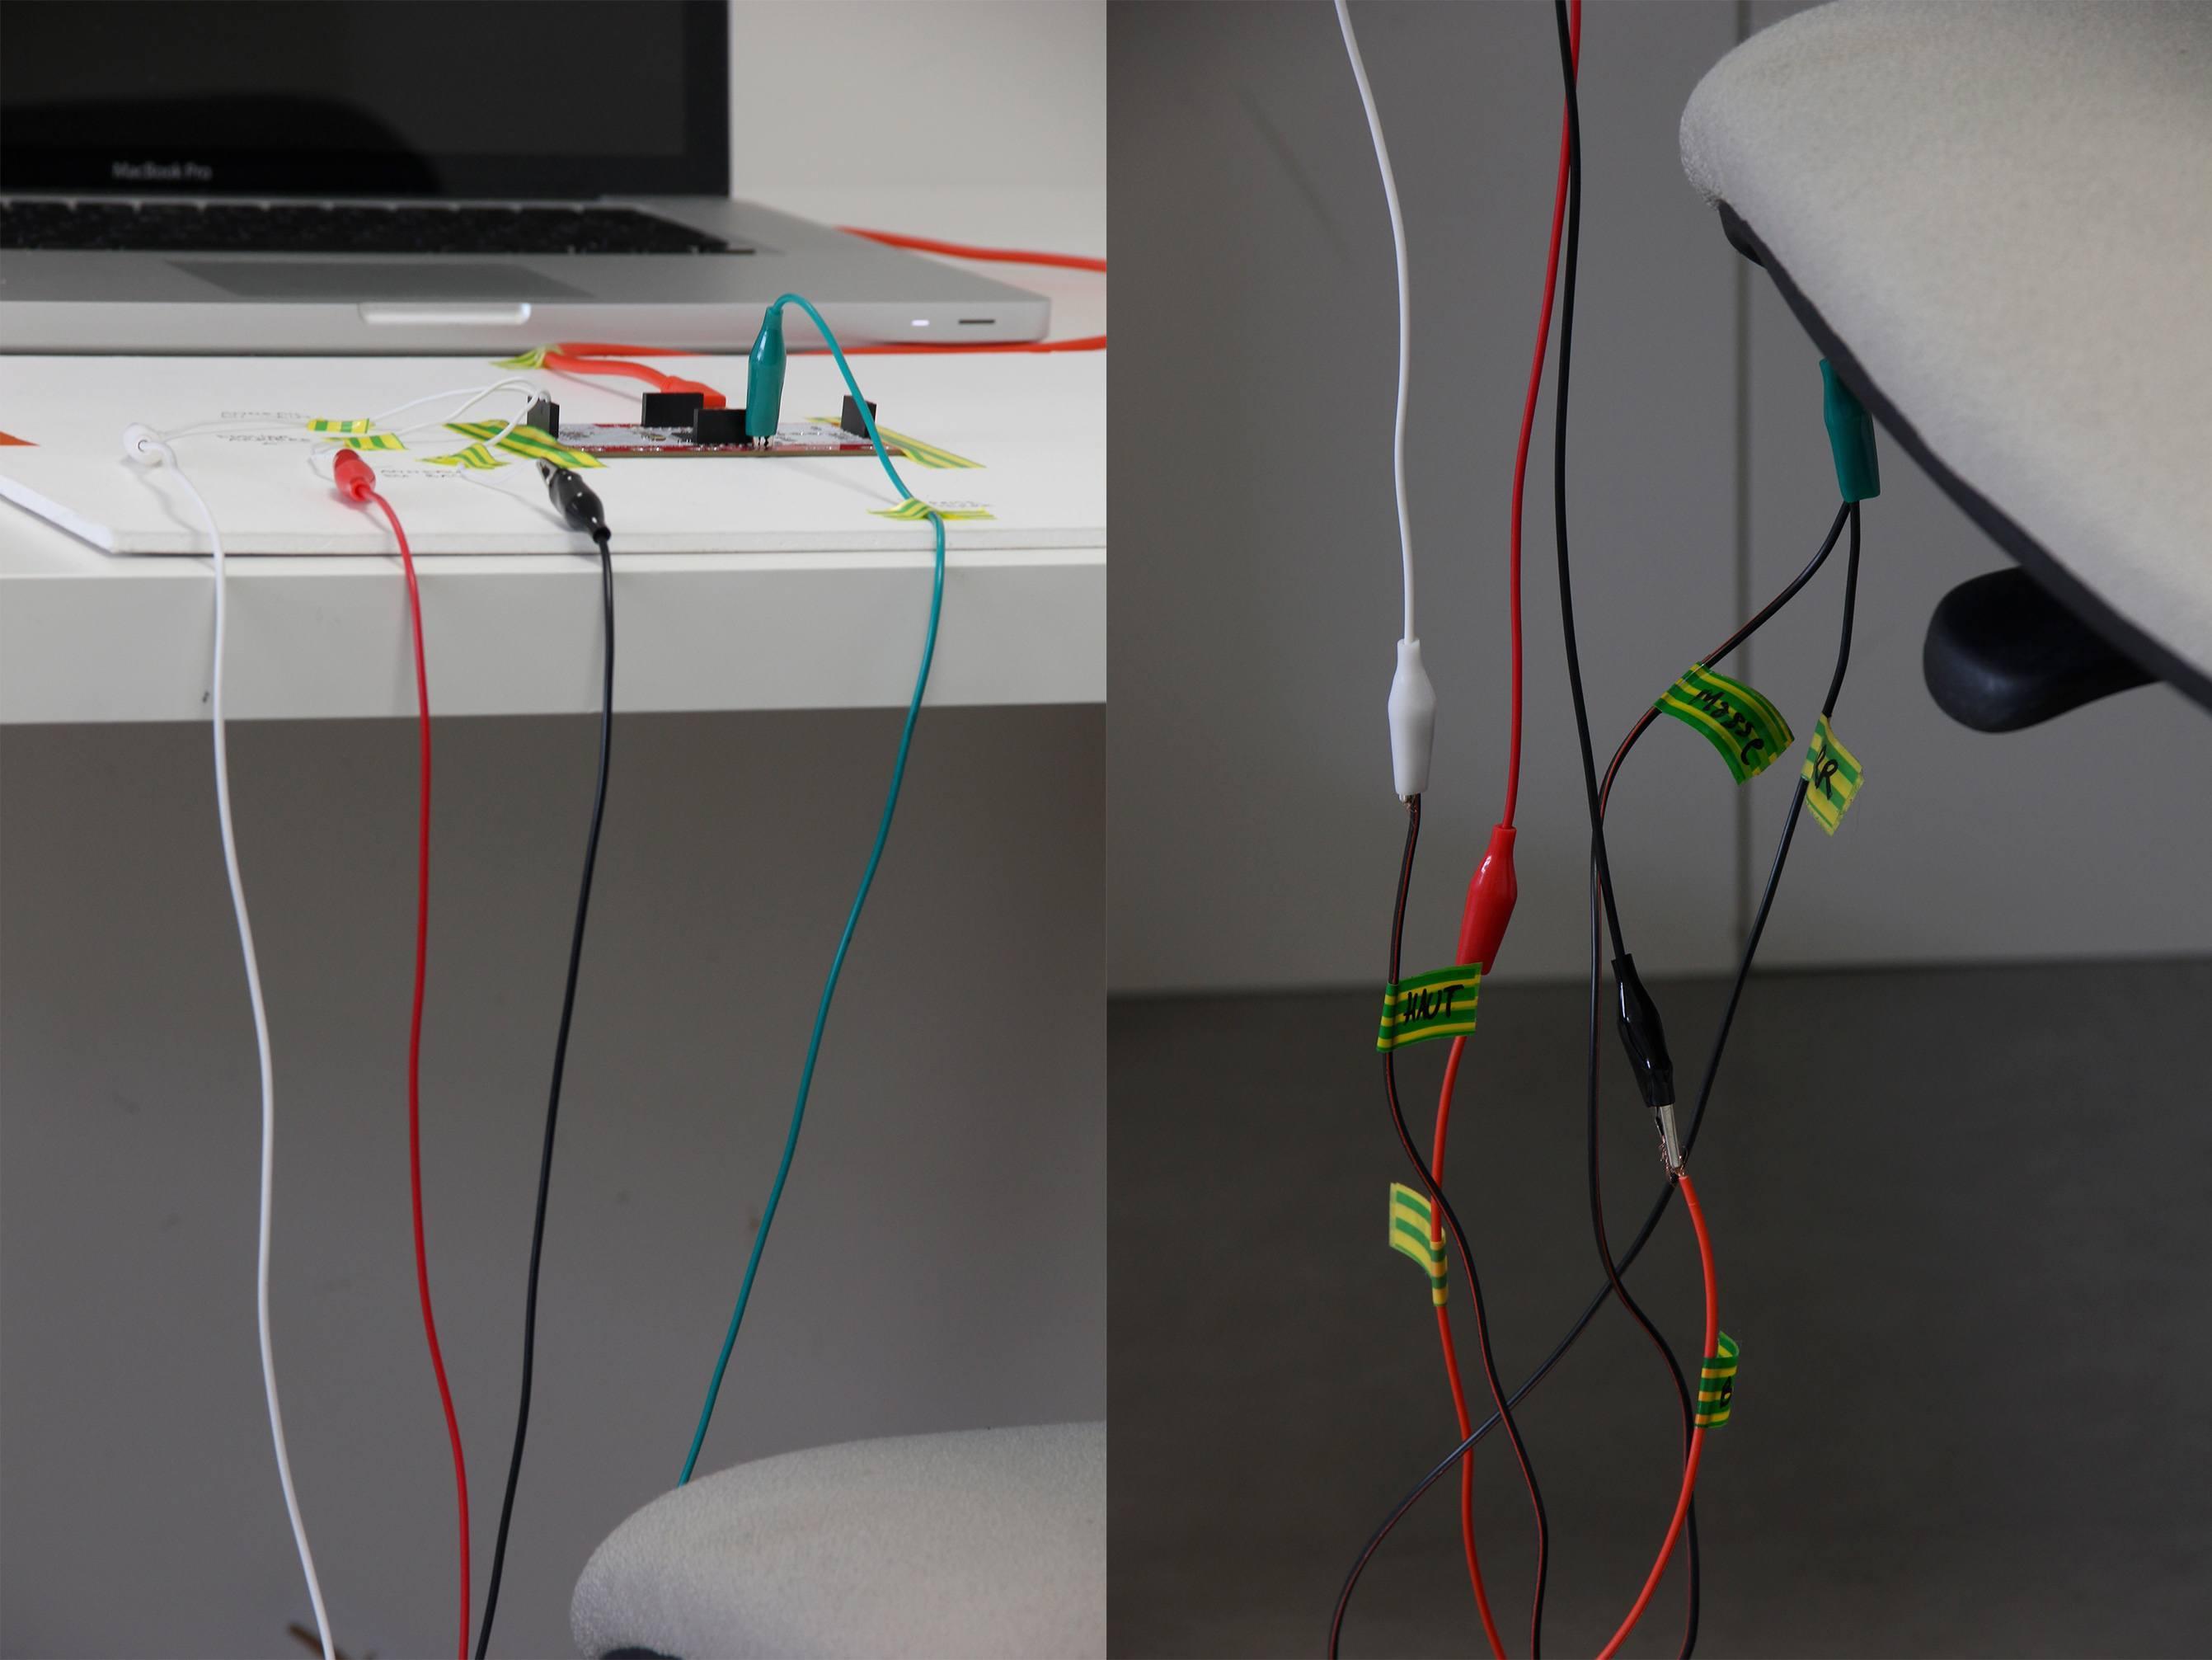 kalla_workshop_arduino_makey_makey_connected_chair_details2-maxime-cavallie-pierre-felix-so